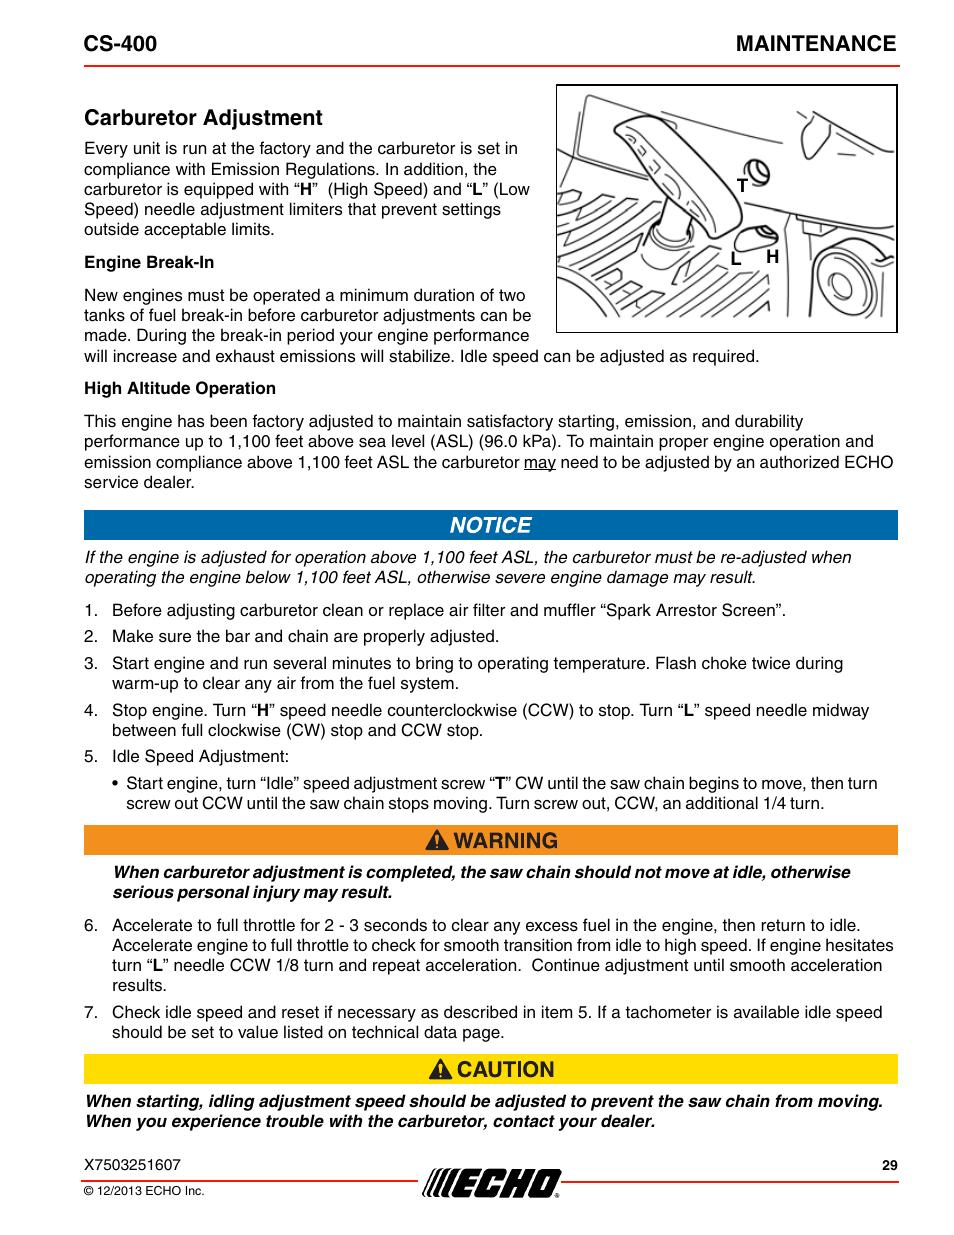 Carburetor adjustment, Cs-400 maintenance | Echo CS-400 User